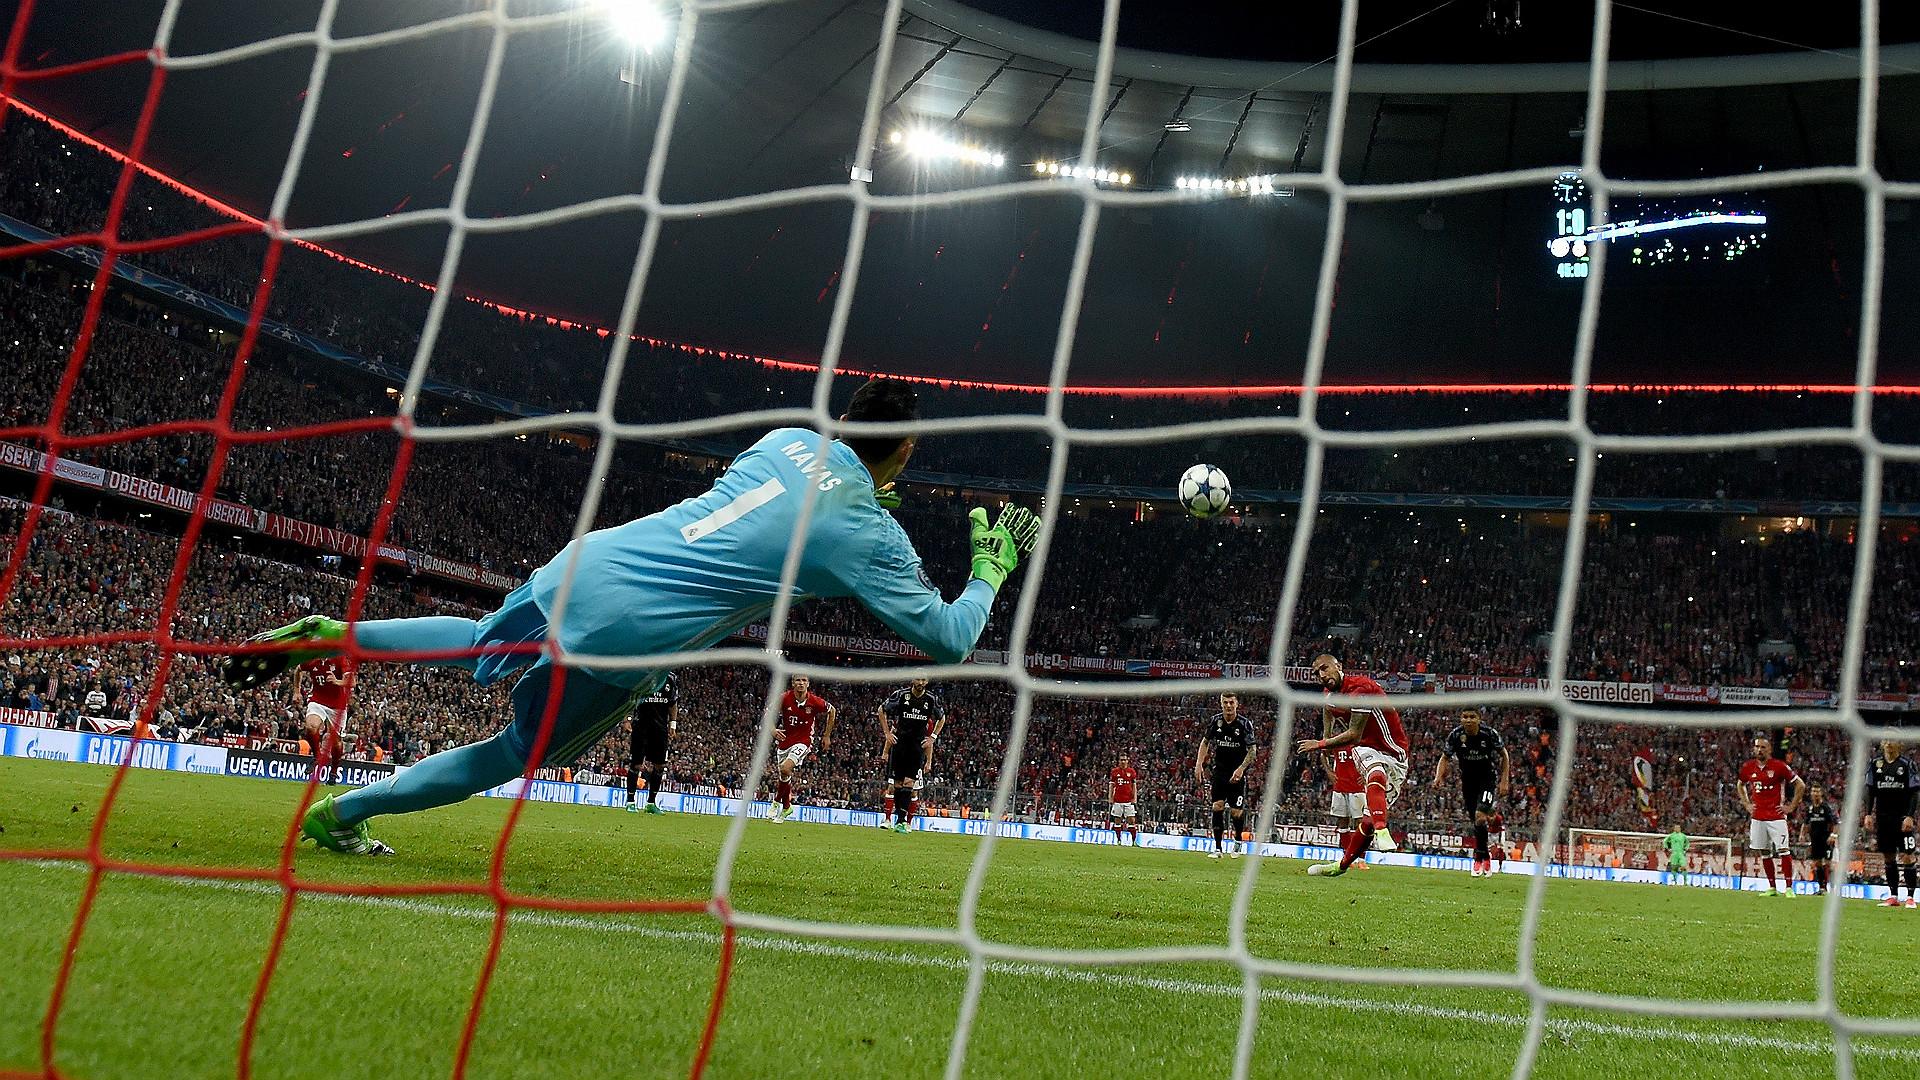 Keylor Navas Arturo Vidal Penalty Bayern Munchen Real Madrid UEFA Champions League